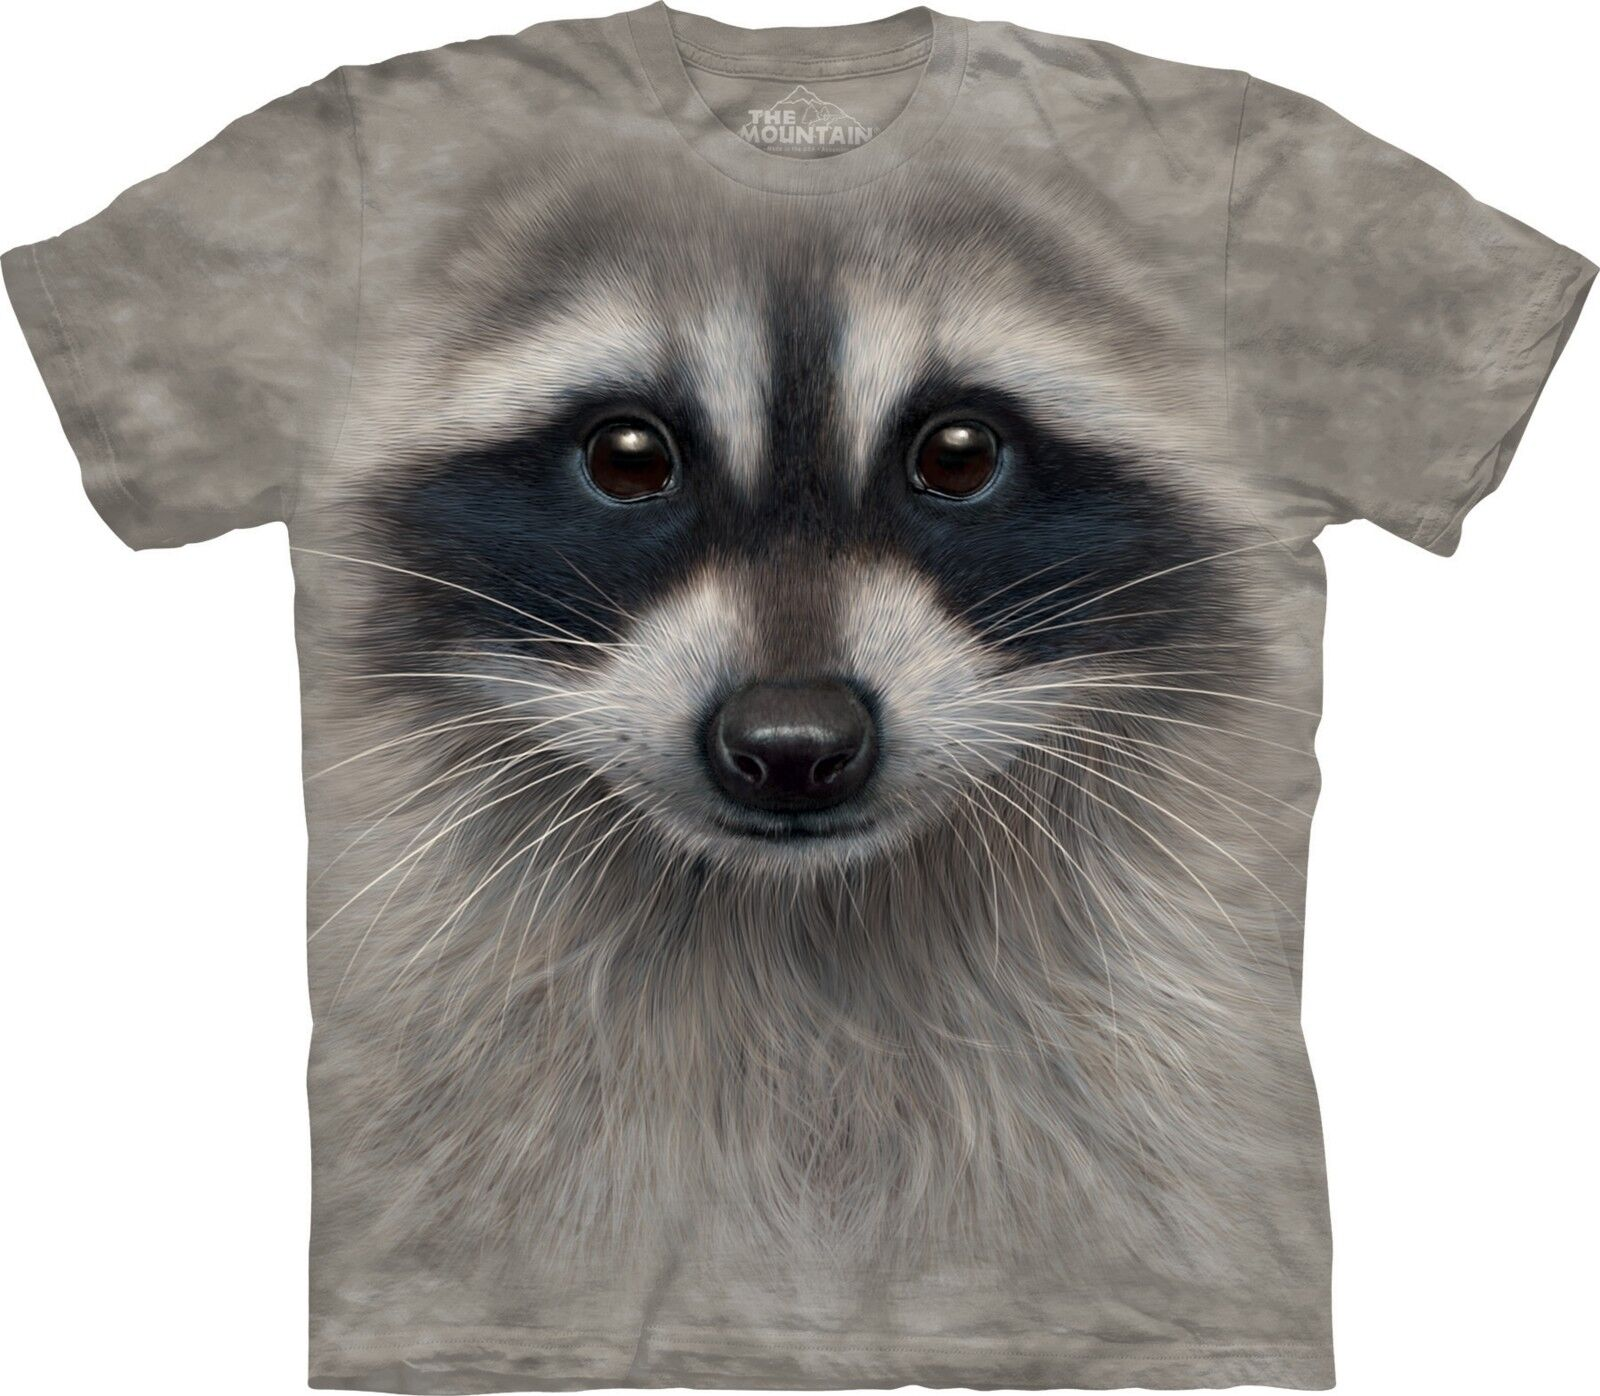 Raccoon Face Animals T Shirt Adult Unisex The Mountain